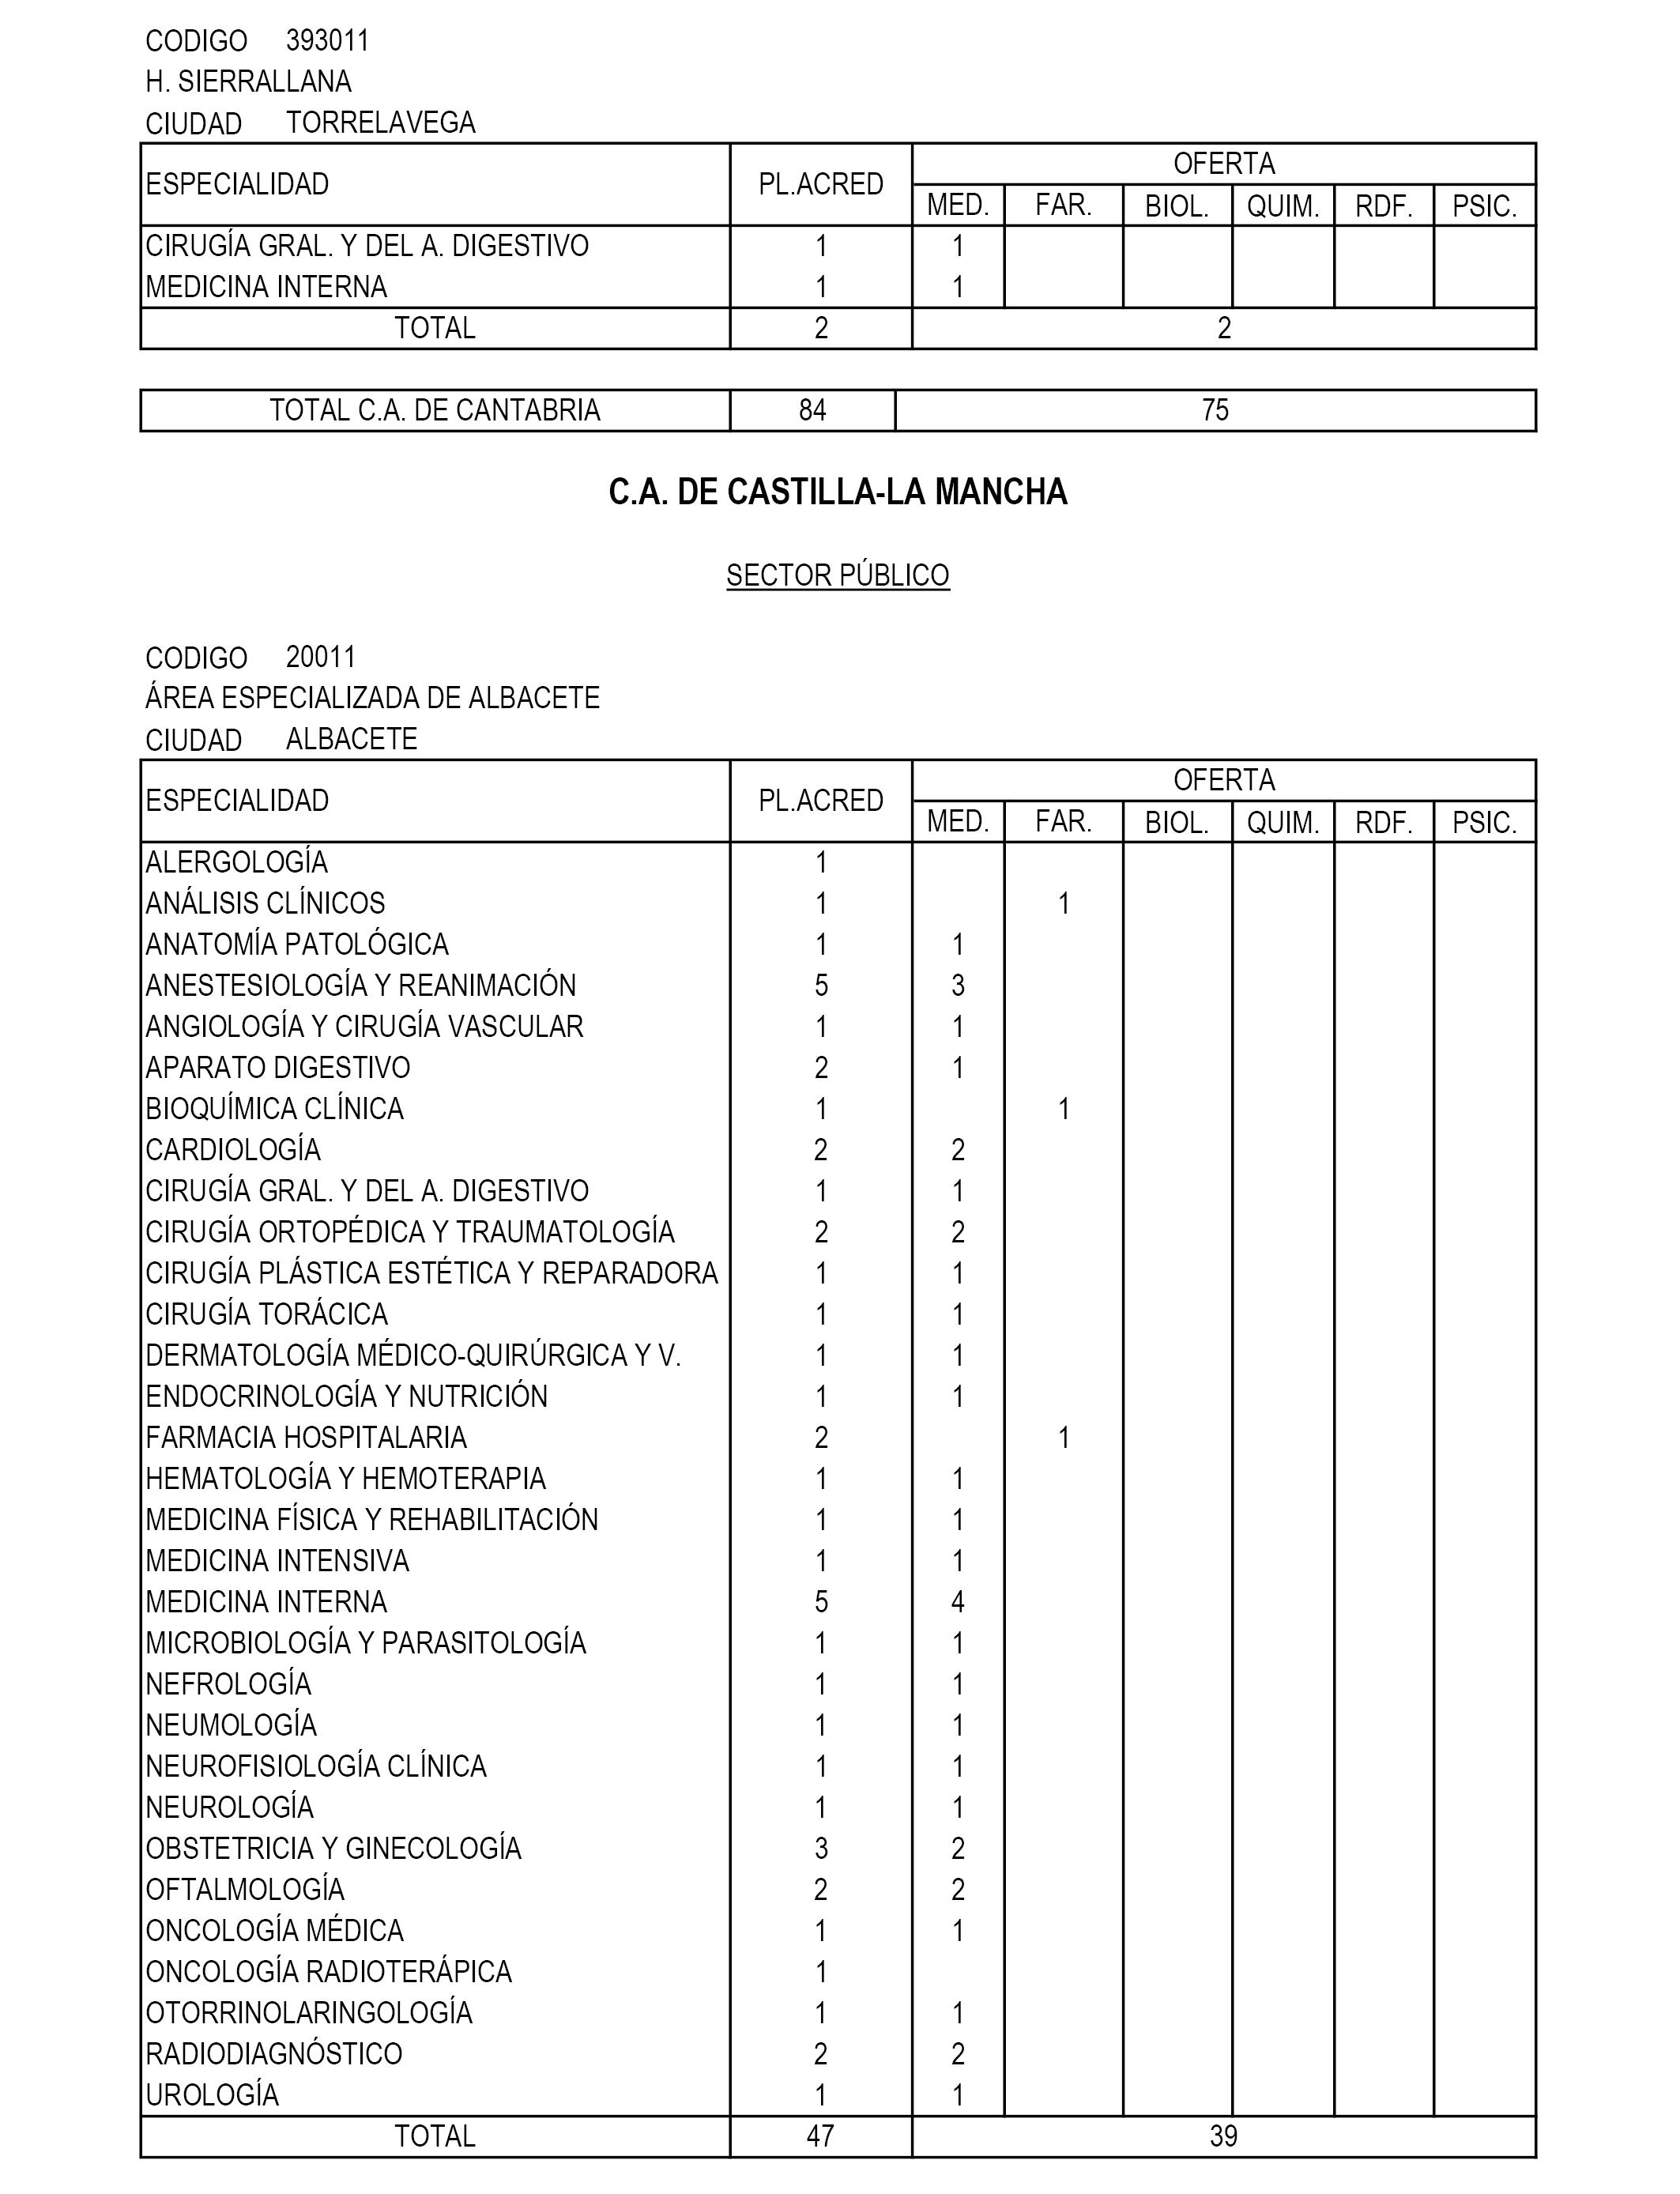 BOE.es - Documento BOE-A-2016-8391